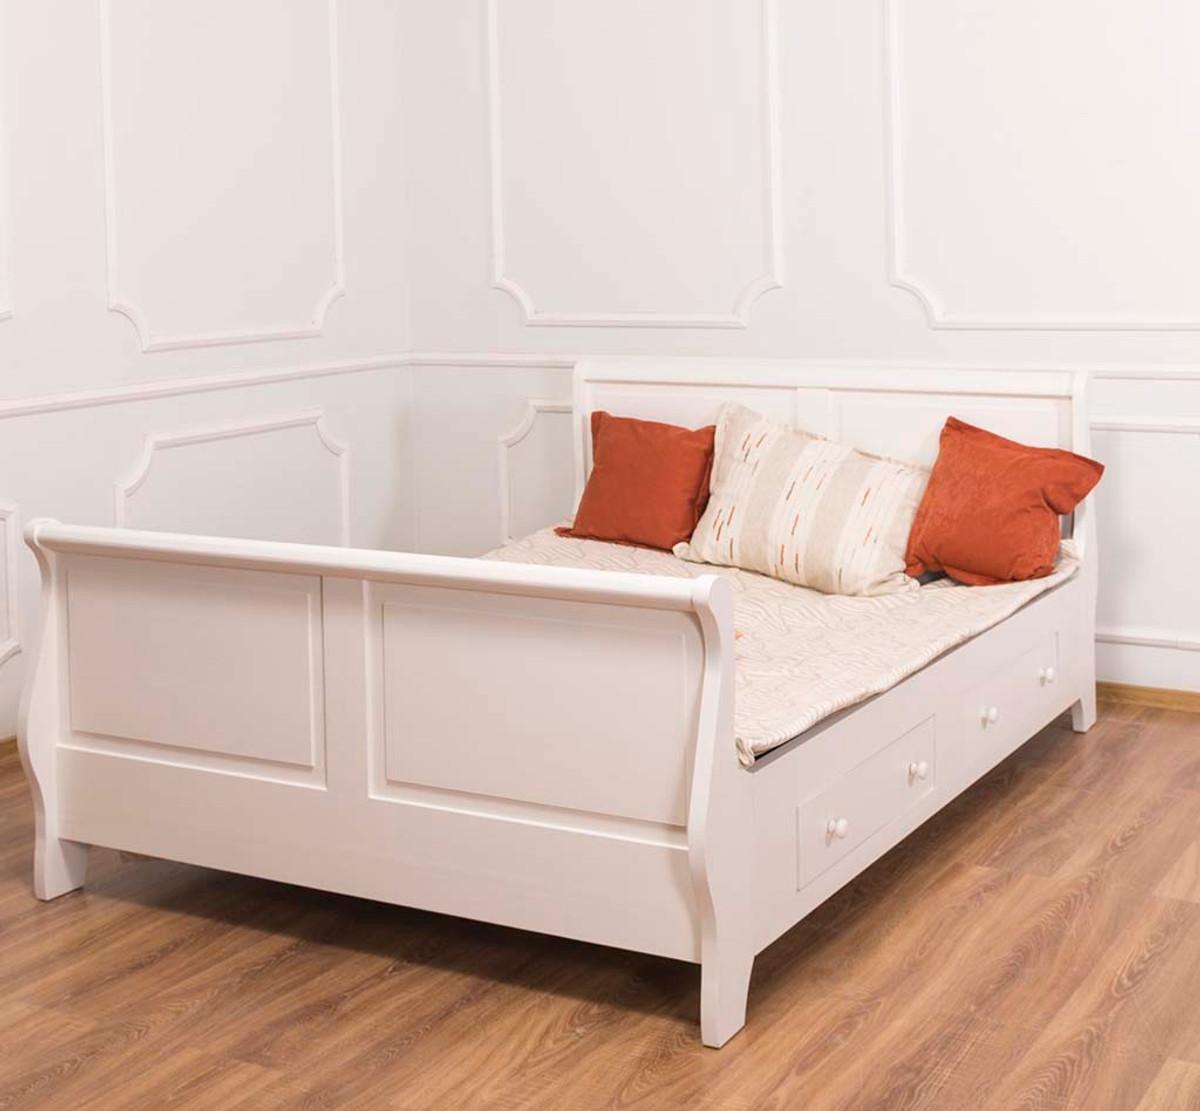 Casa Padrino Landhausstil Bett Altweiß 140 x 200 cm ...